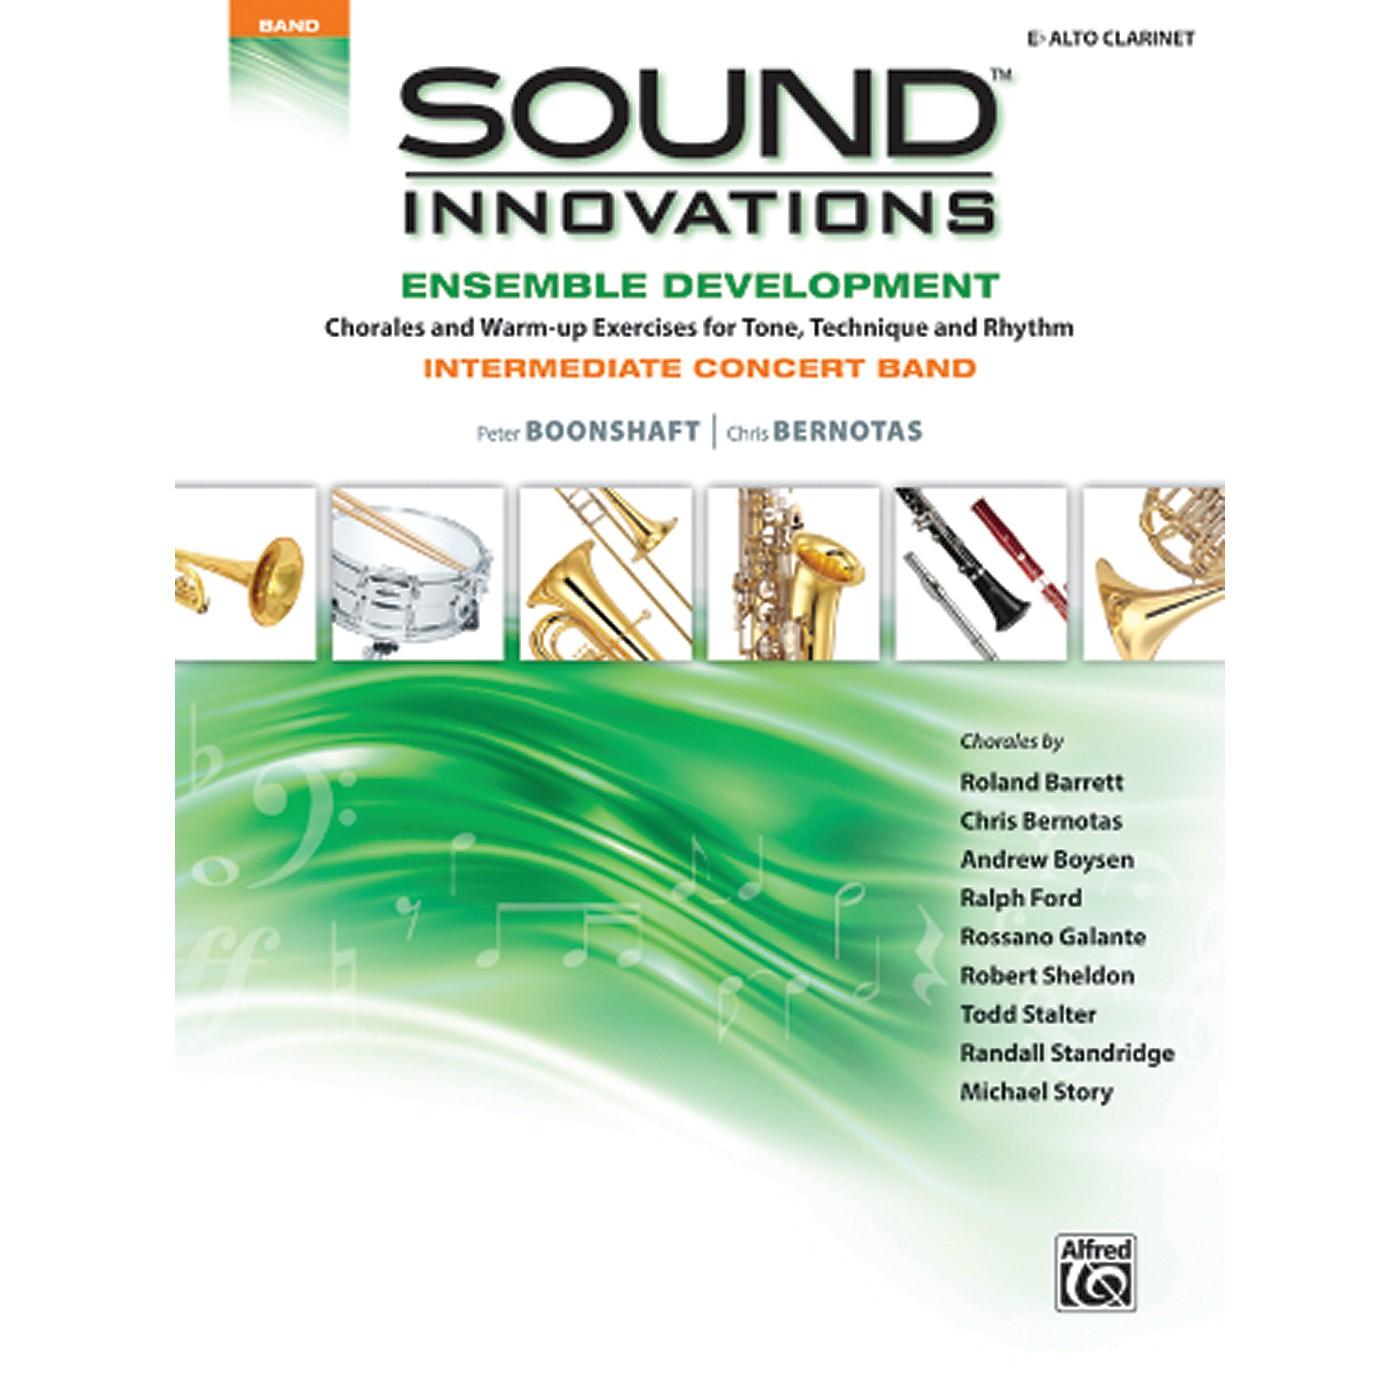 Alfred Sound Innovations Concert Band Ensemble Development E Flat Alto Clarinet Bk thumbnail